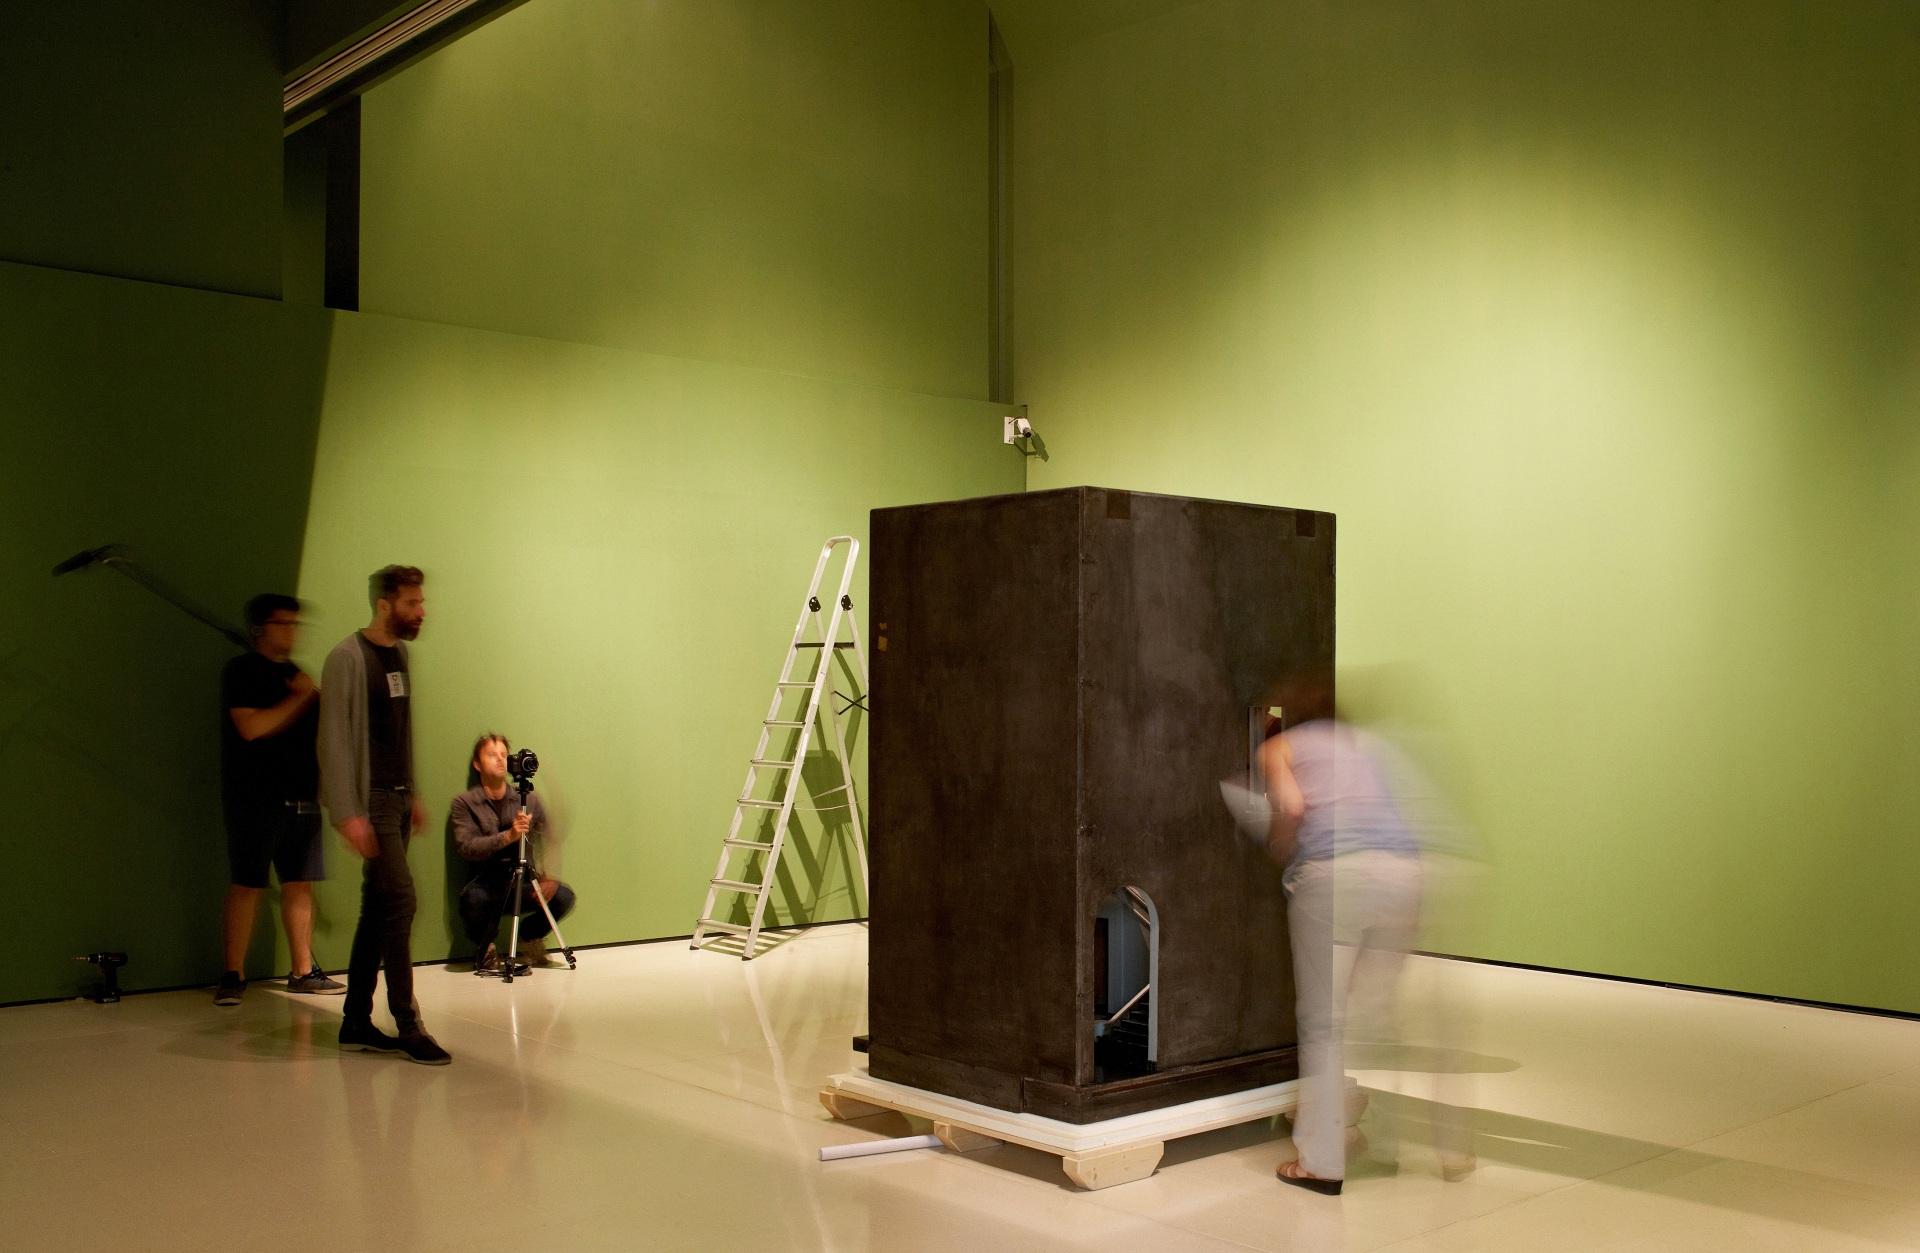 Making of de documental. Director y técnicos en una sala del Museu Nacional d\'Art de Catalunya. Obra de arte en forma de caja negra. De fondo, escalera de mano sobre fondo verde.